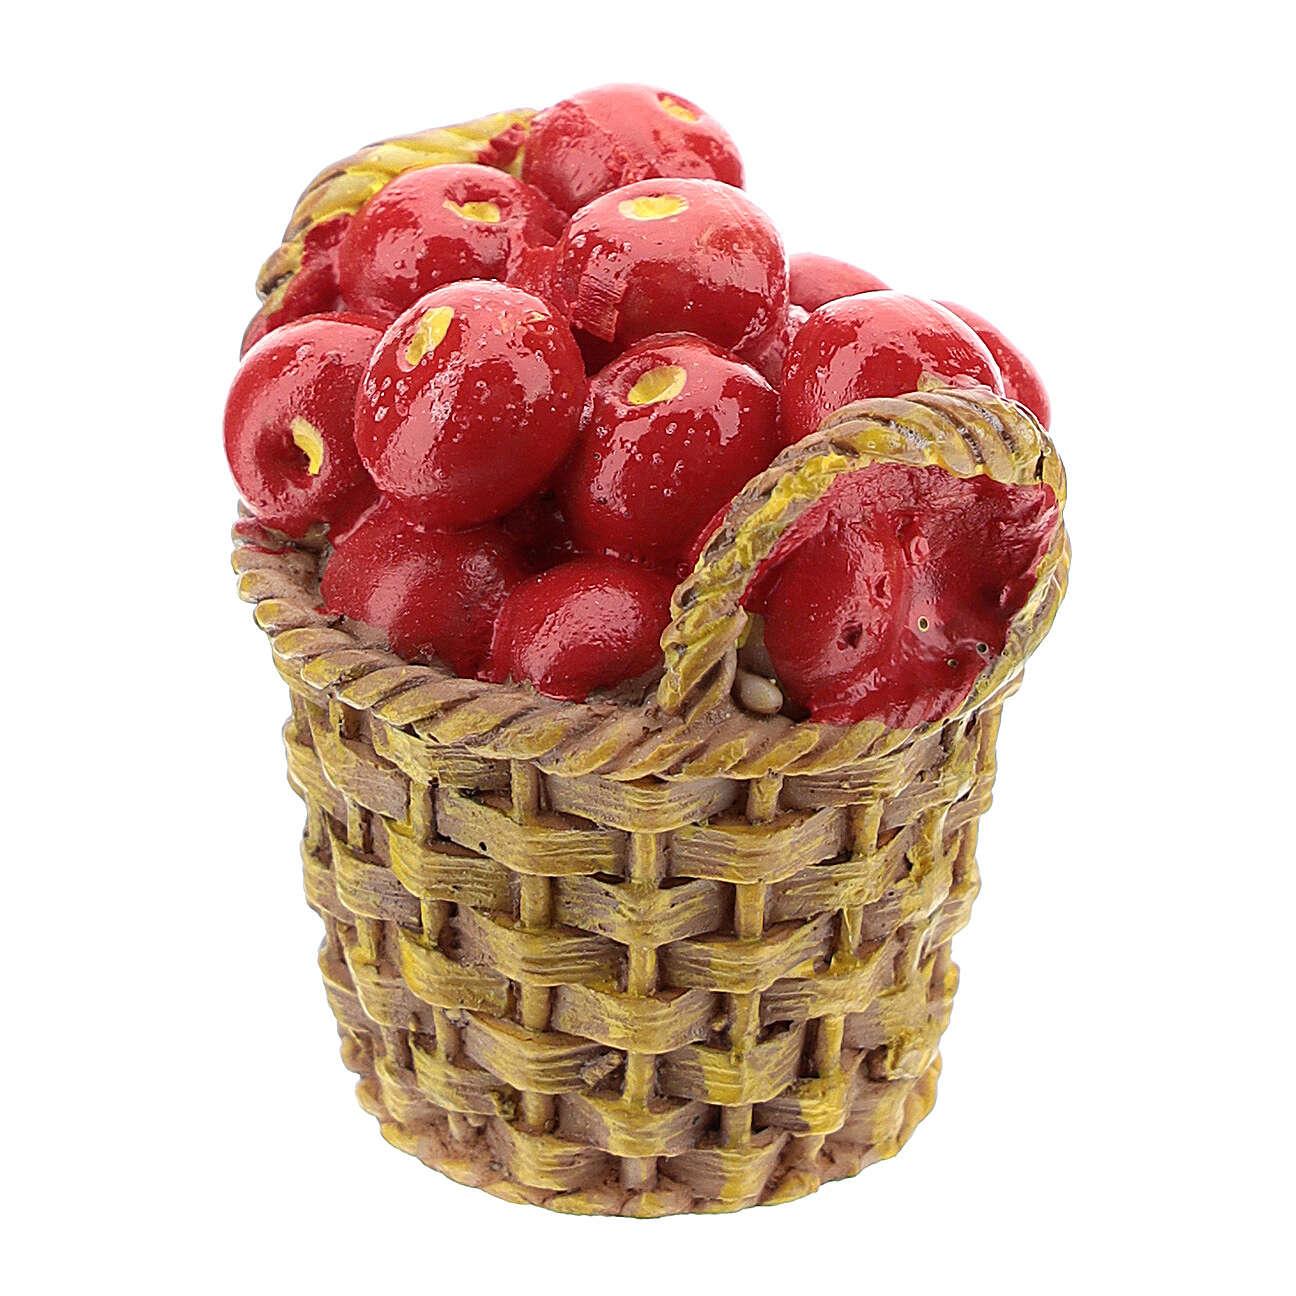 Miniature fruit basket in resin 5x3x3 cm, for 14-16 cm nativity 4